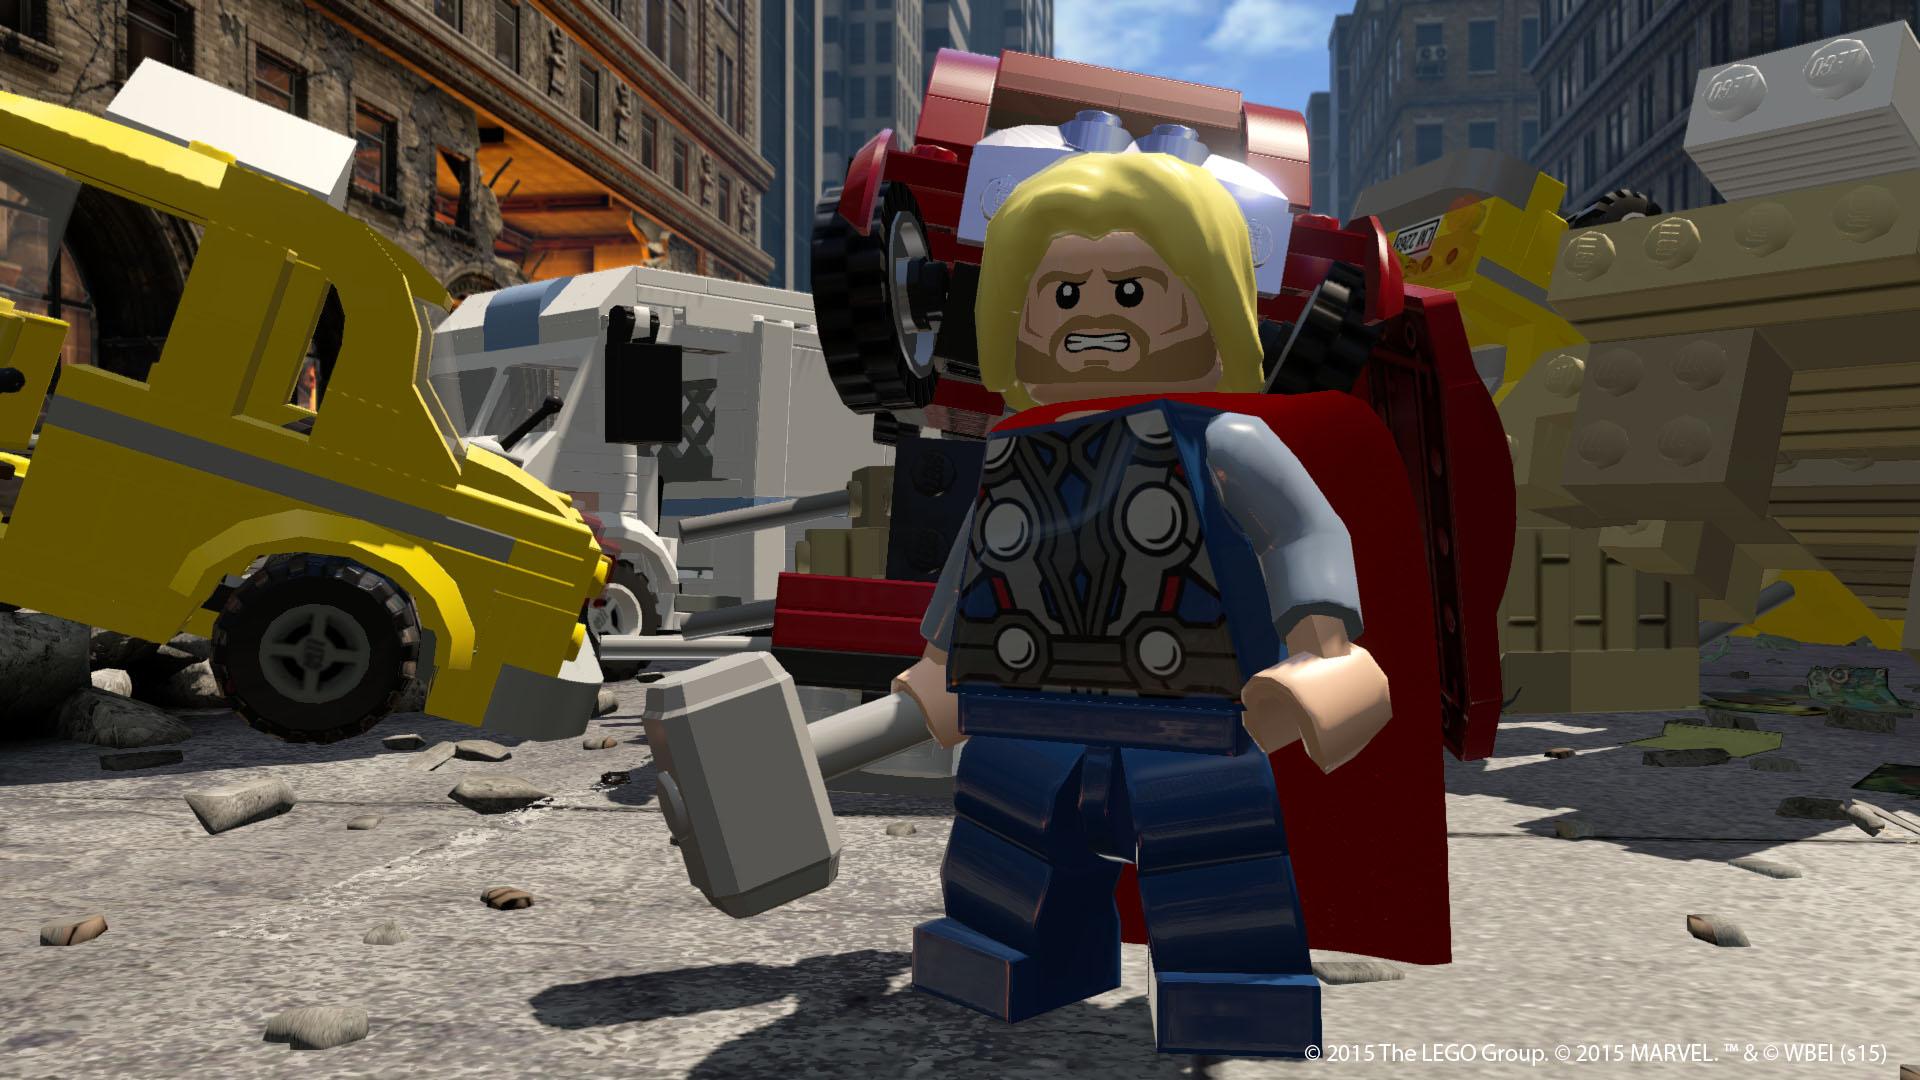 LEGO_Marvels_Avengers_E3_2015_Thor_1434442067